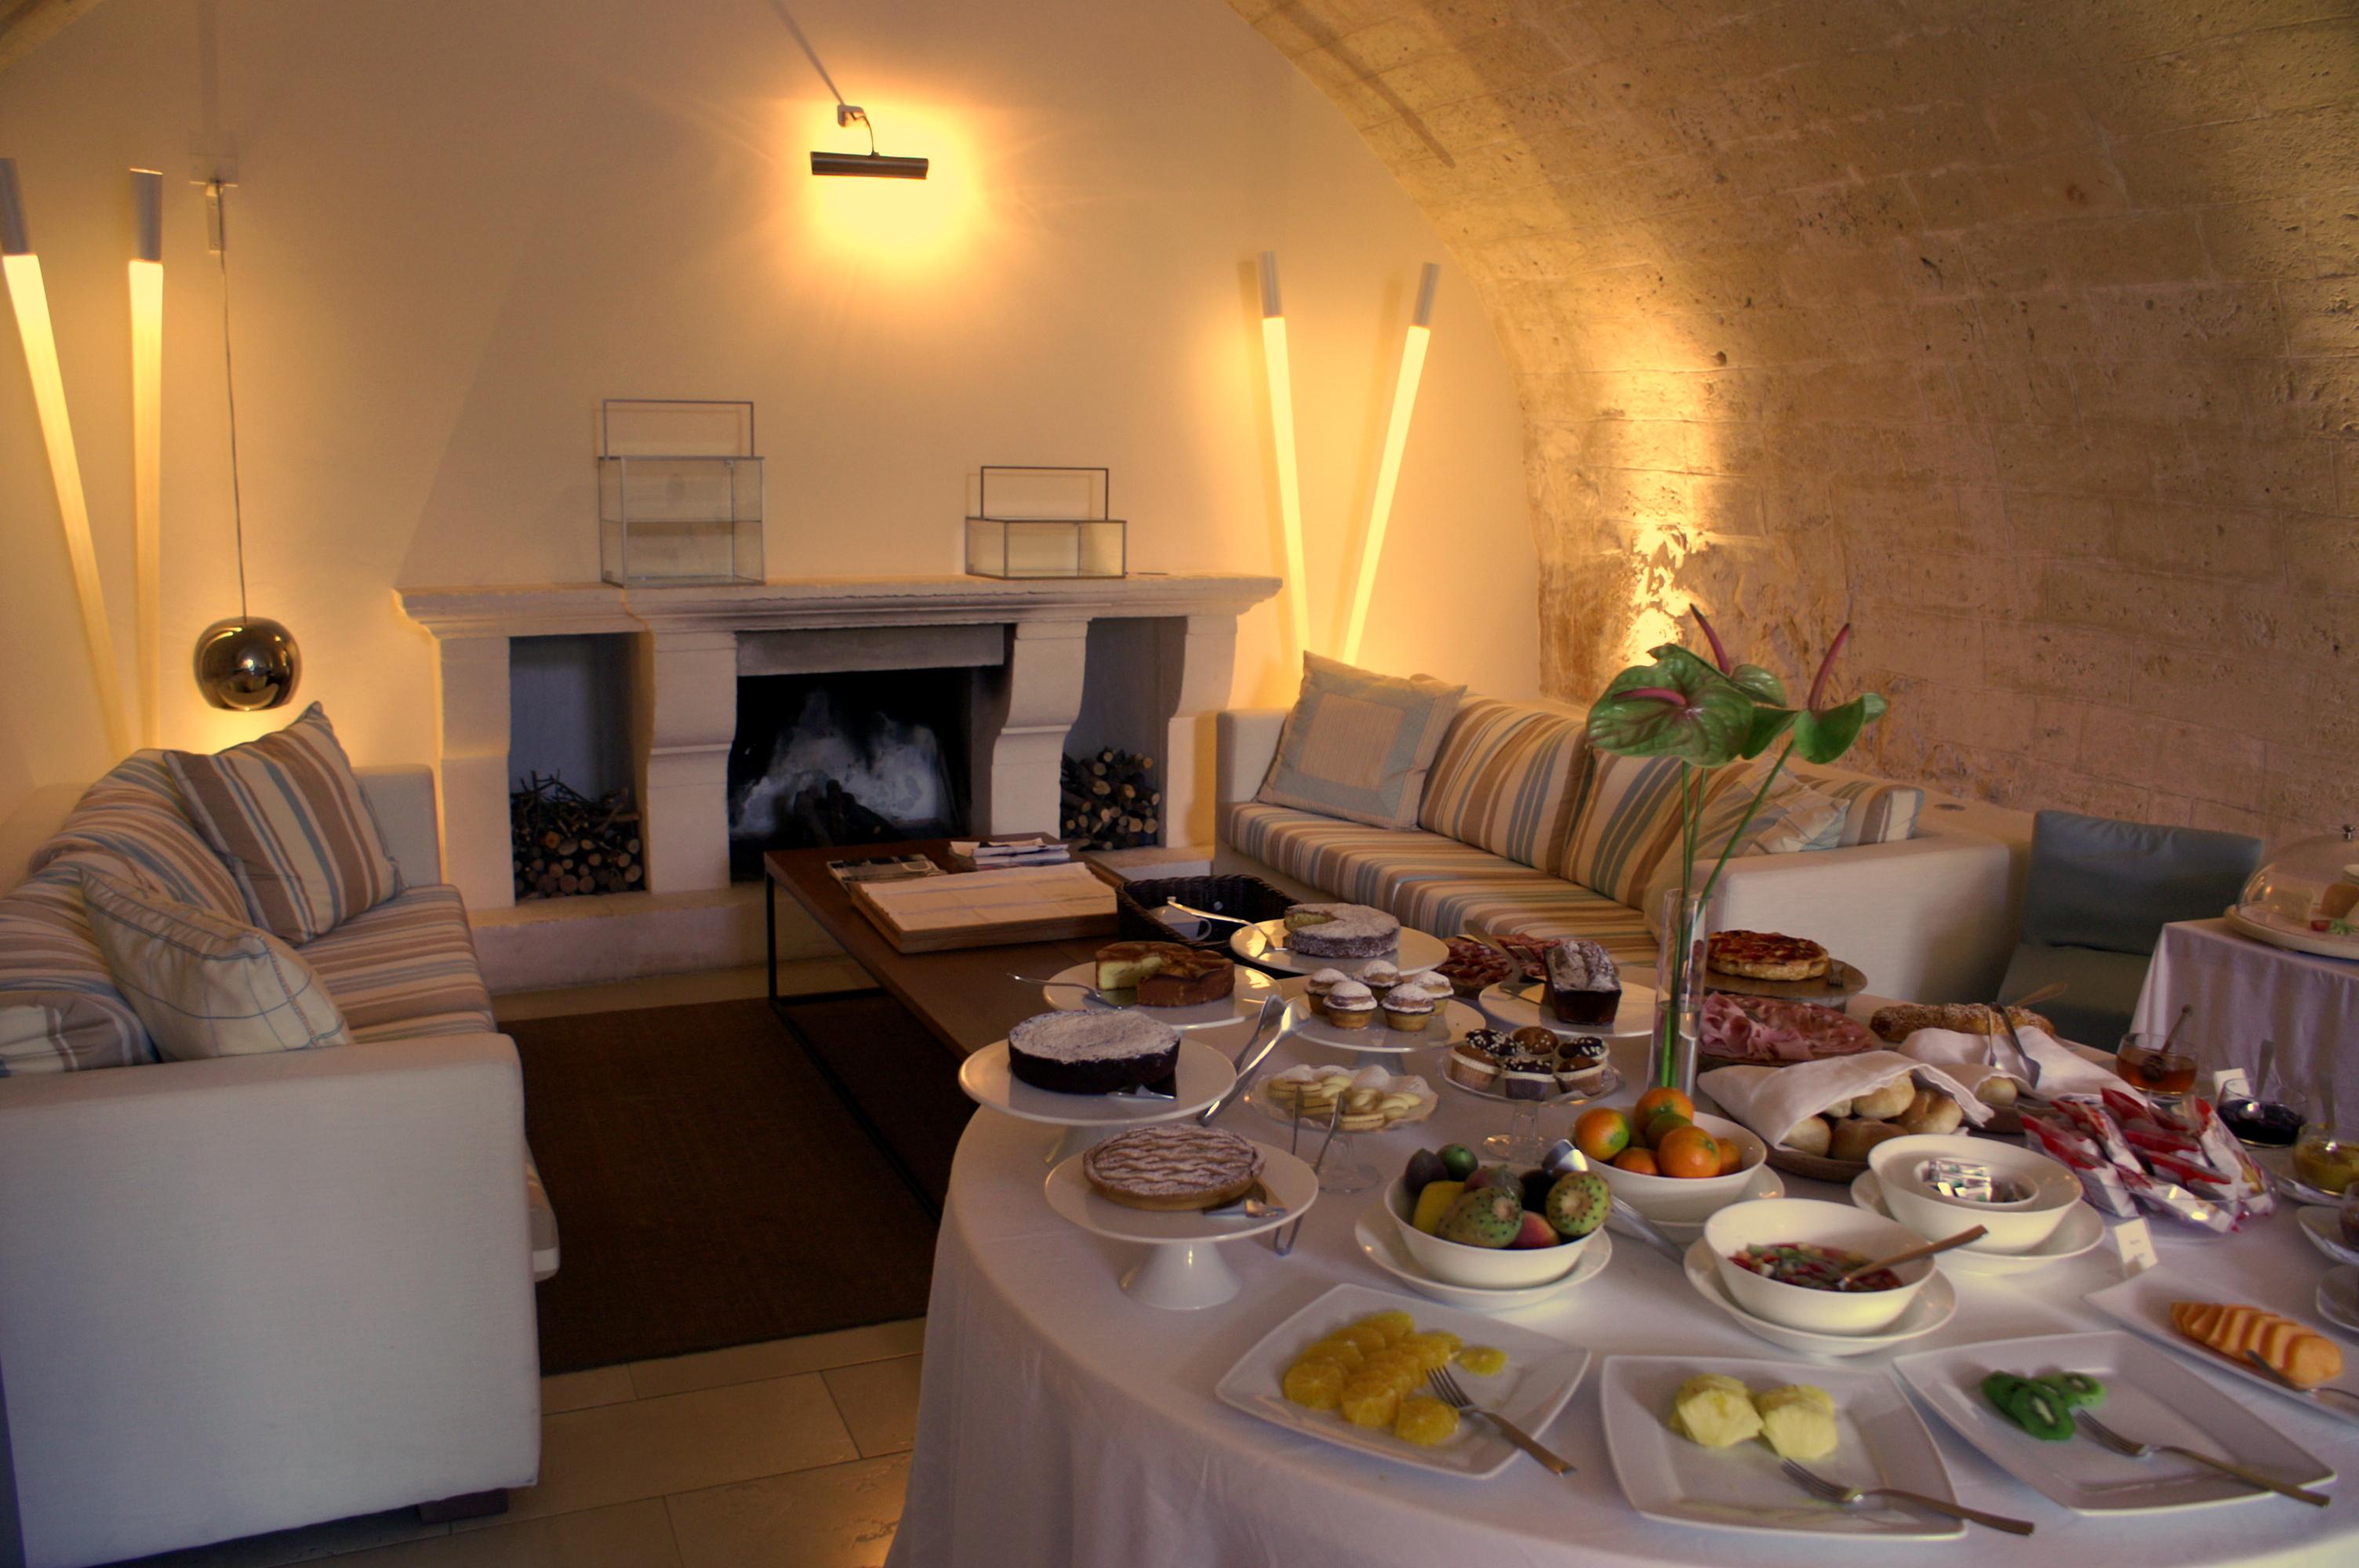 breakfast buffet at La Sommità Relais hotel, cavernous room, decorative illumination